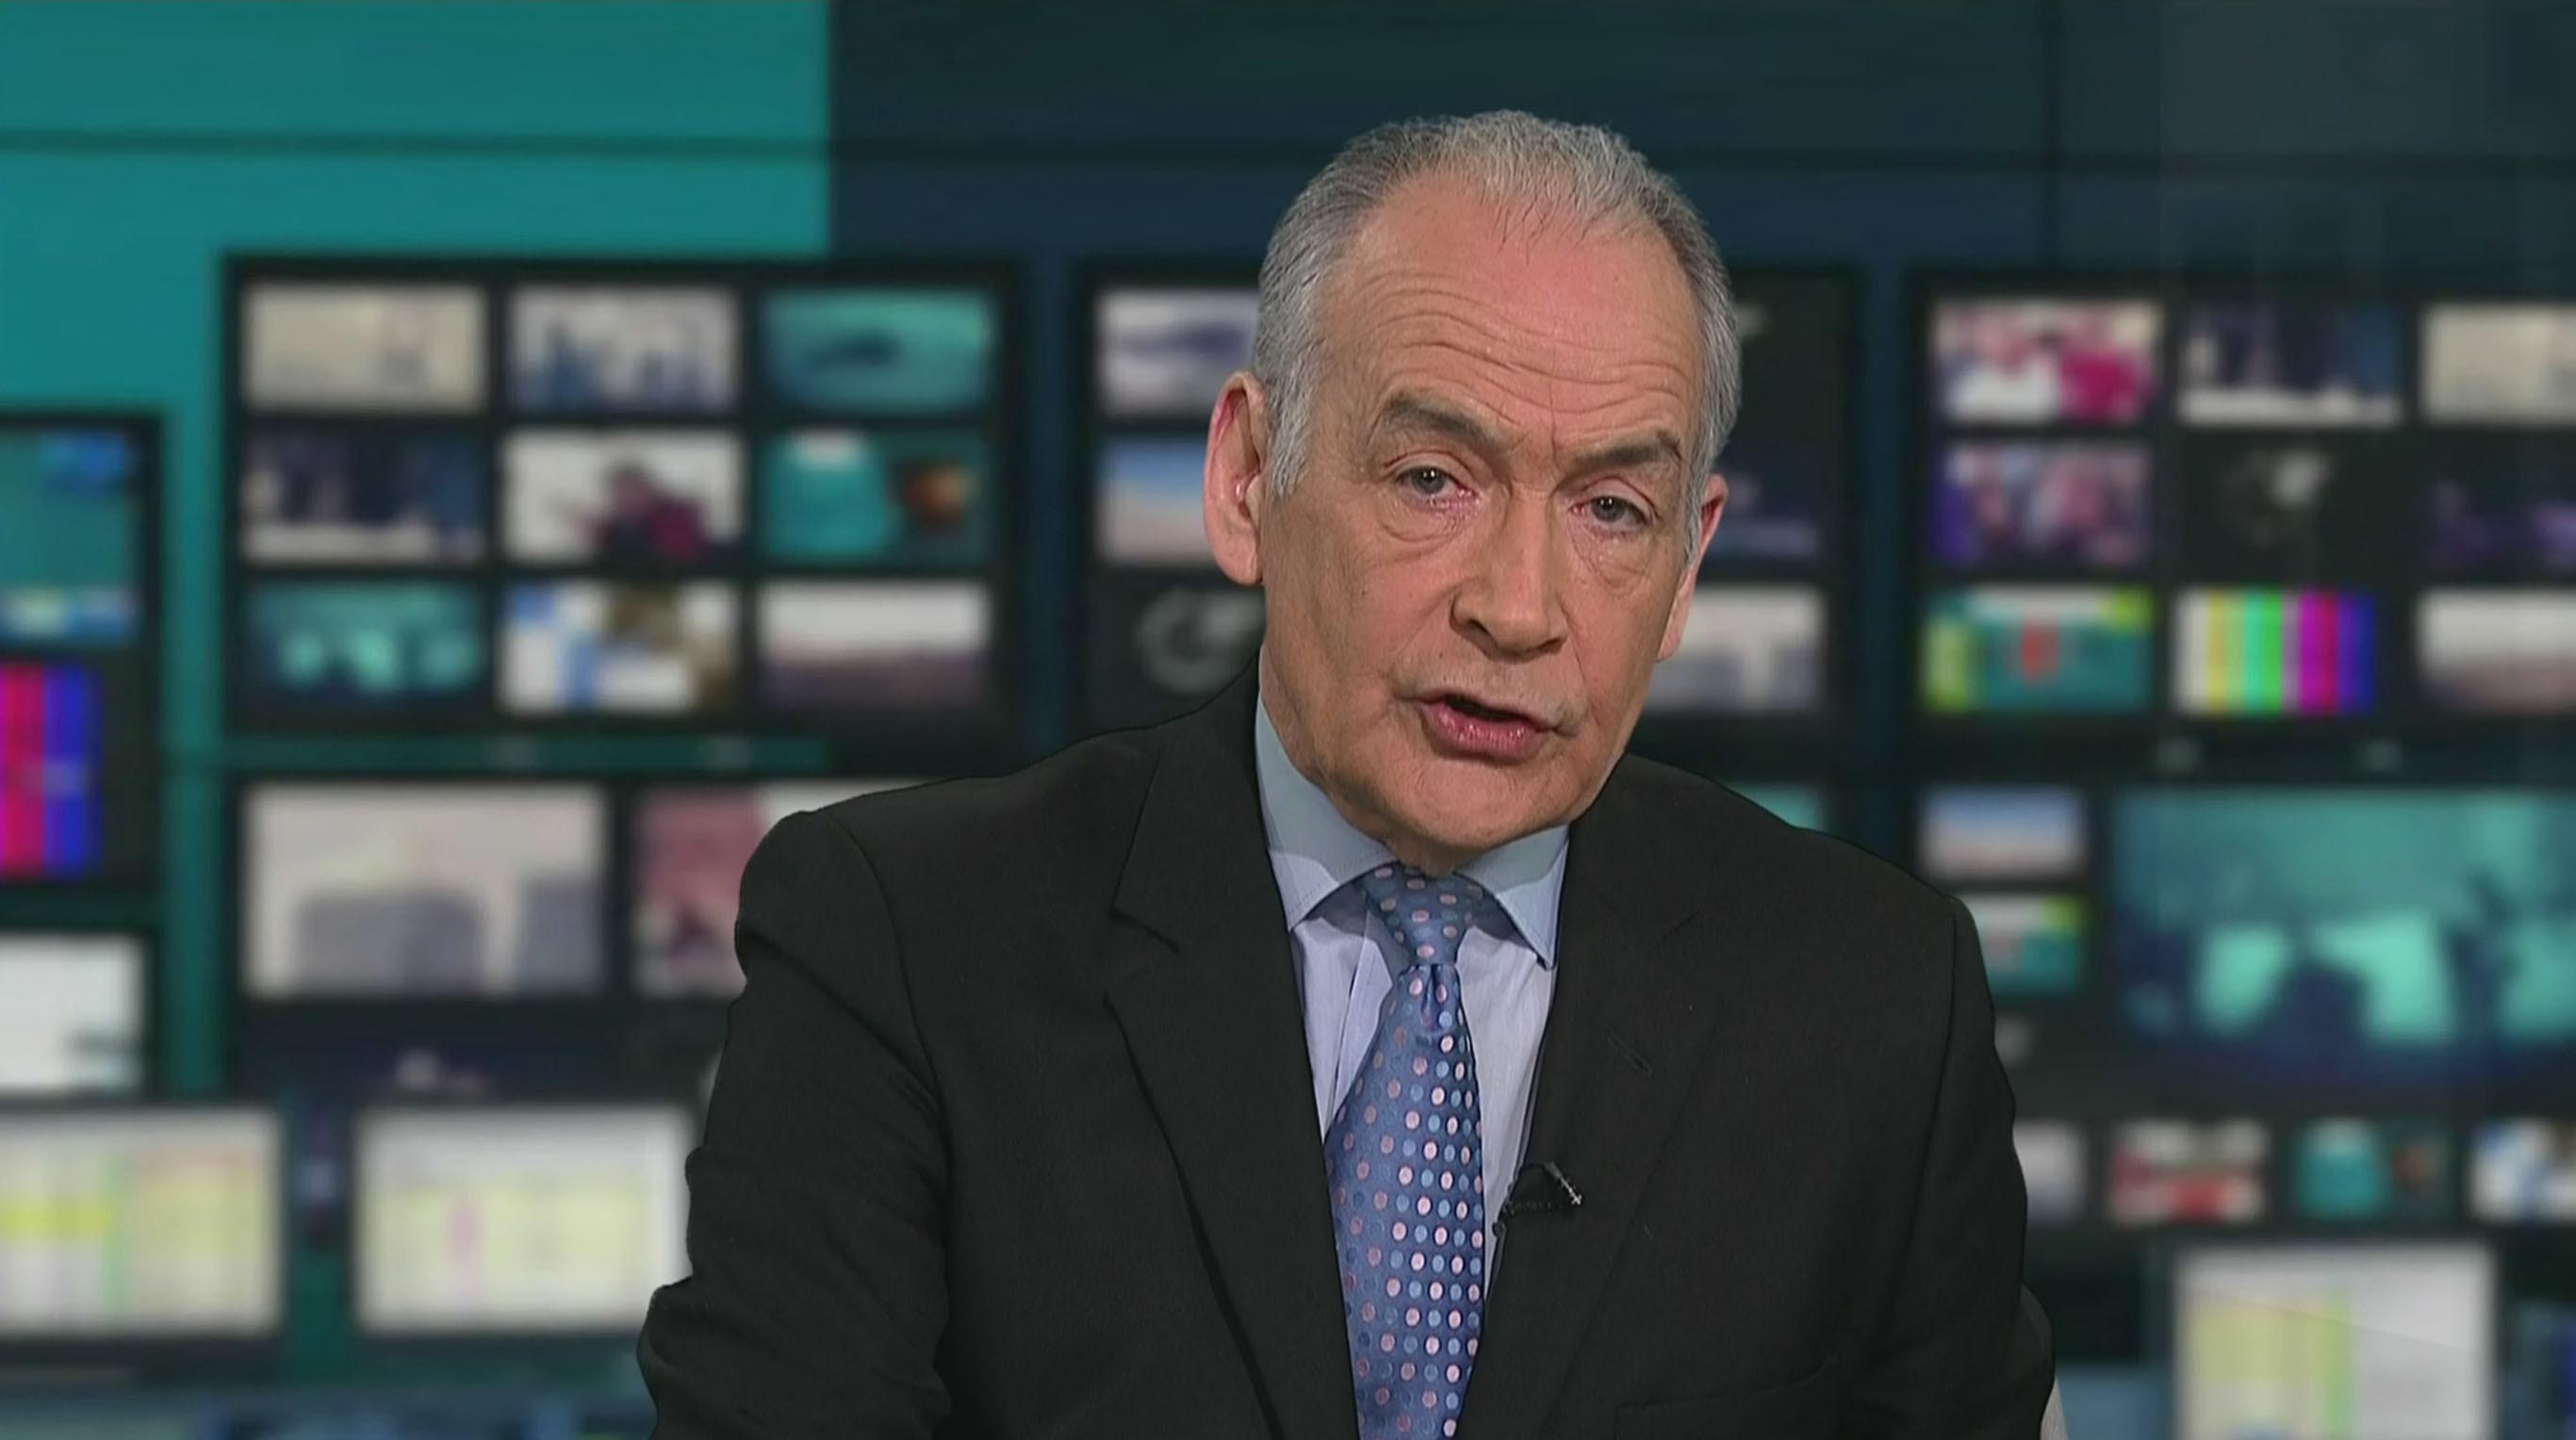 Alastair Stewart steps down as ITV News presenter over 'errors of judgement'